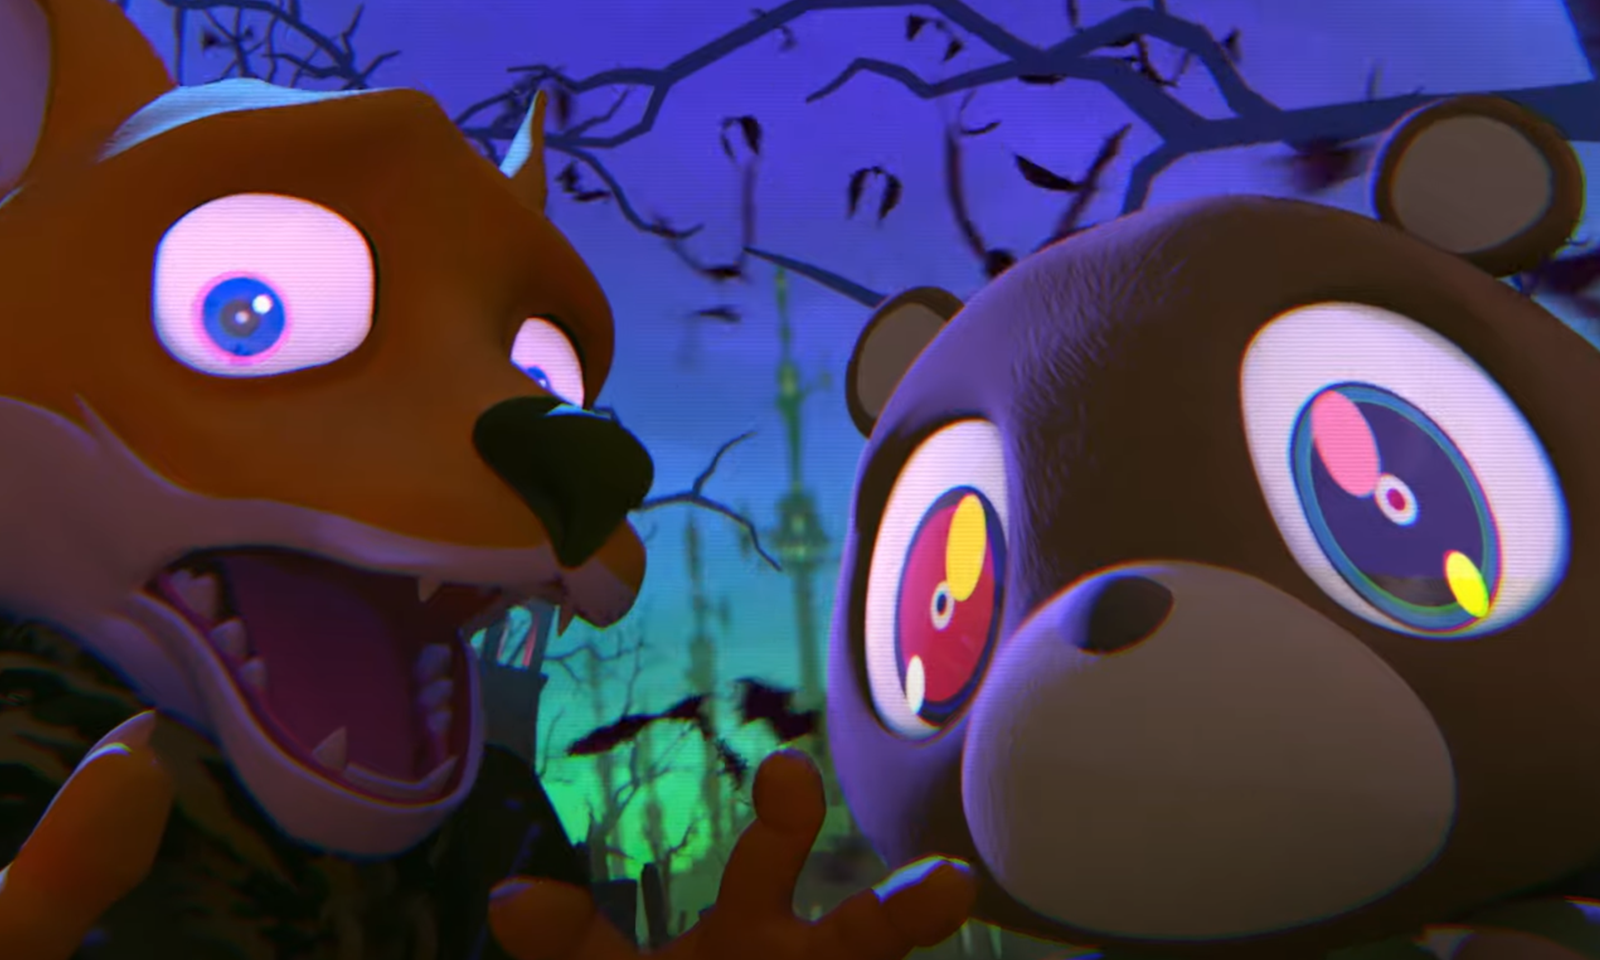 Kanye West 与 Kid Cudi 将推出《Kids See Ghosts》同名动画片